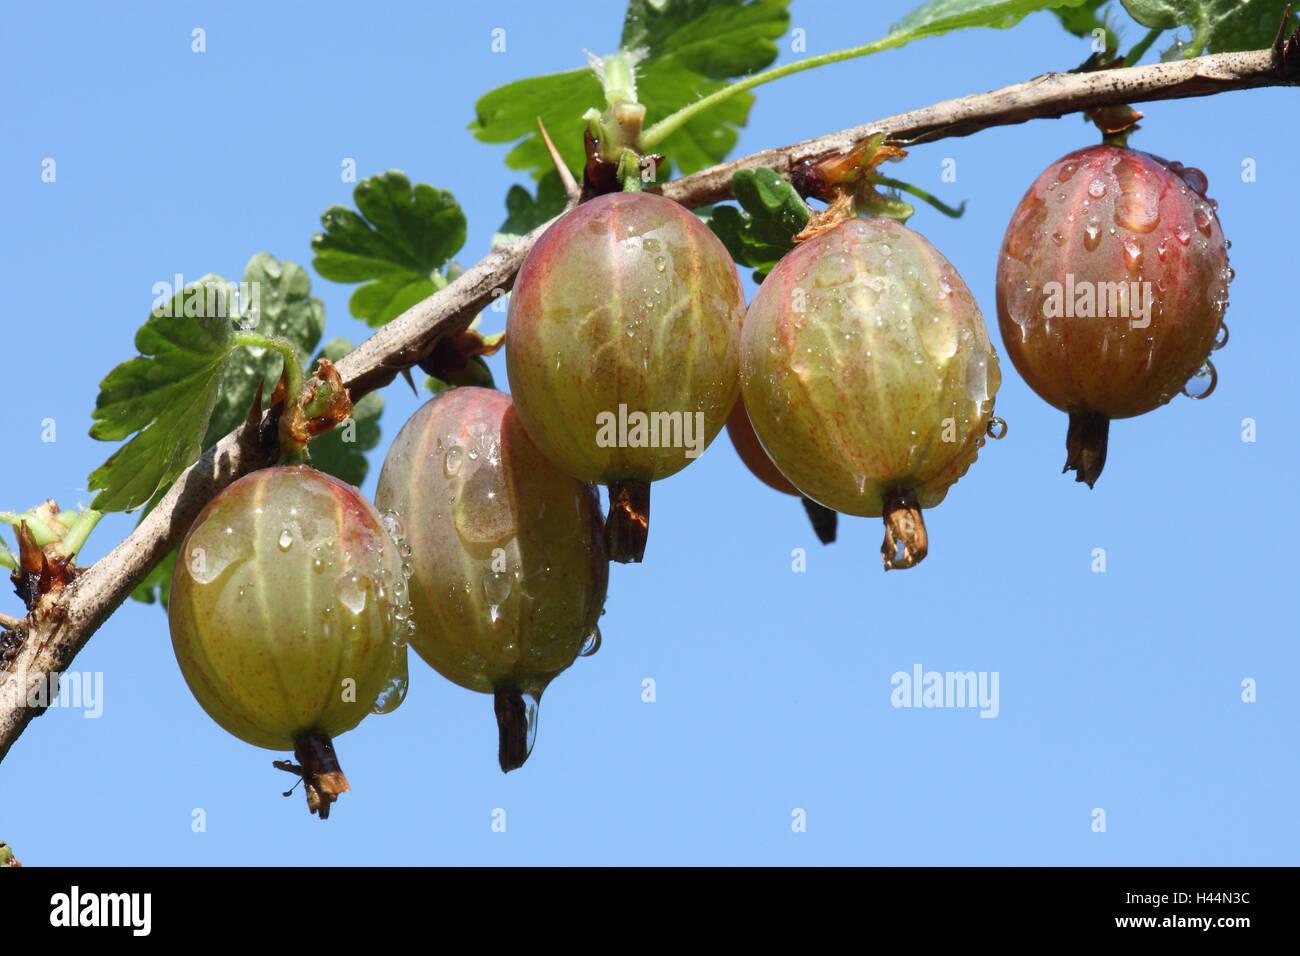 Gooseberry, Ribes uva-crispa, - Stock Image